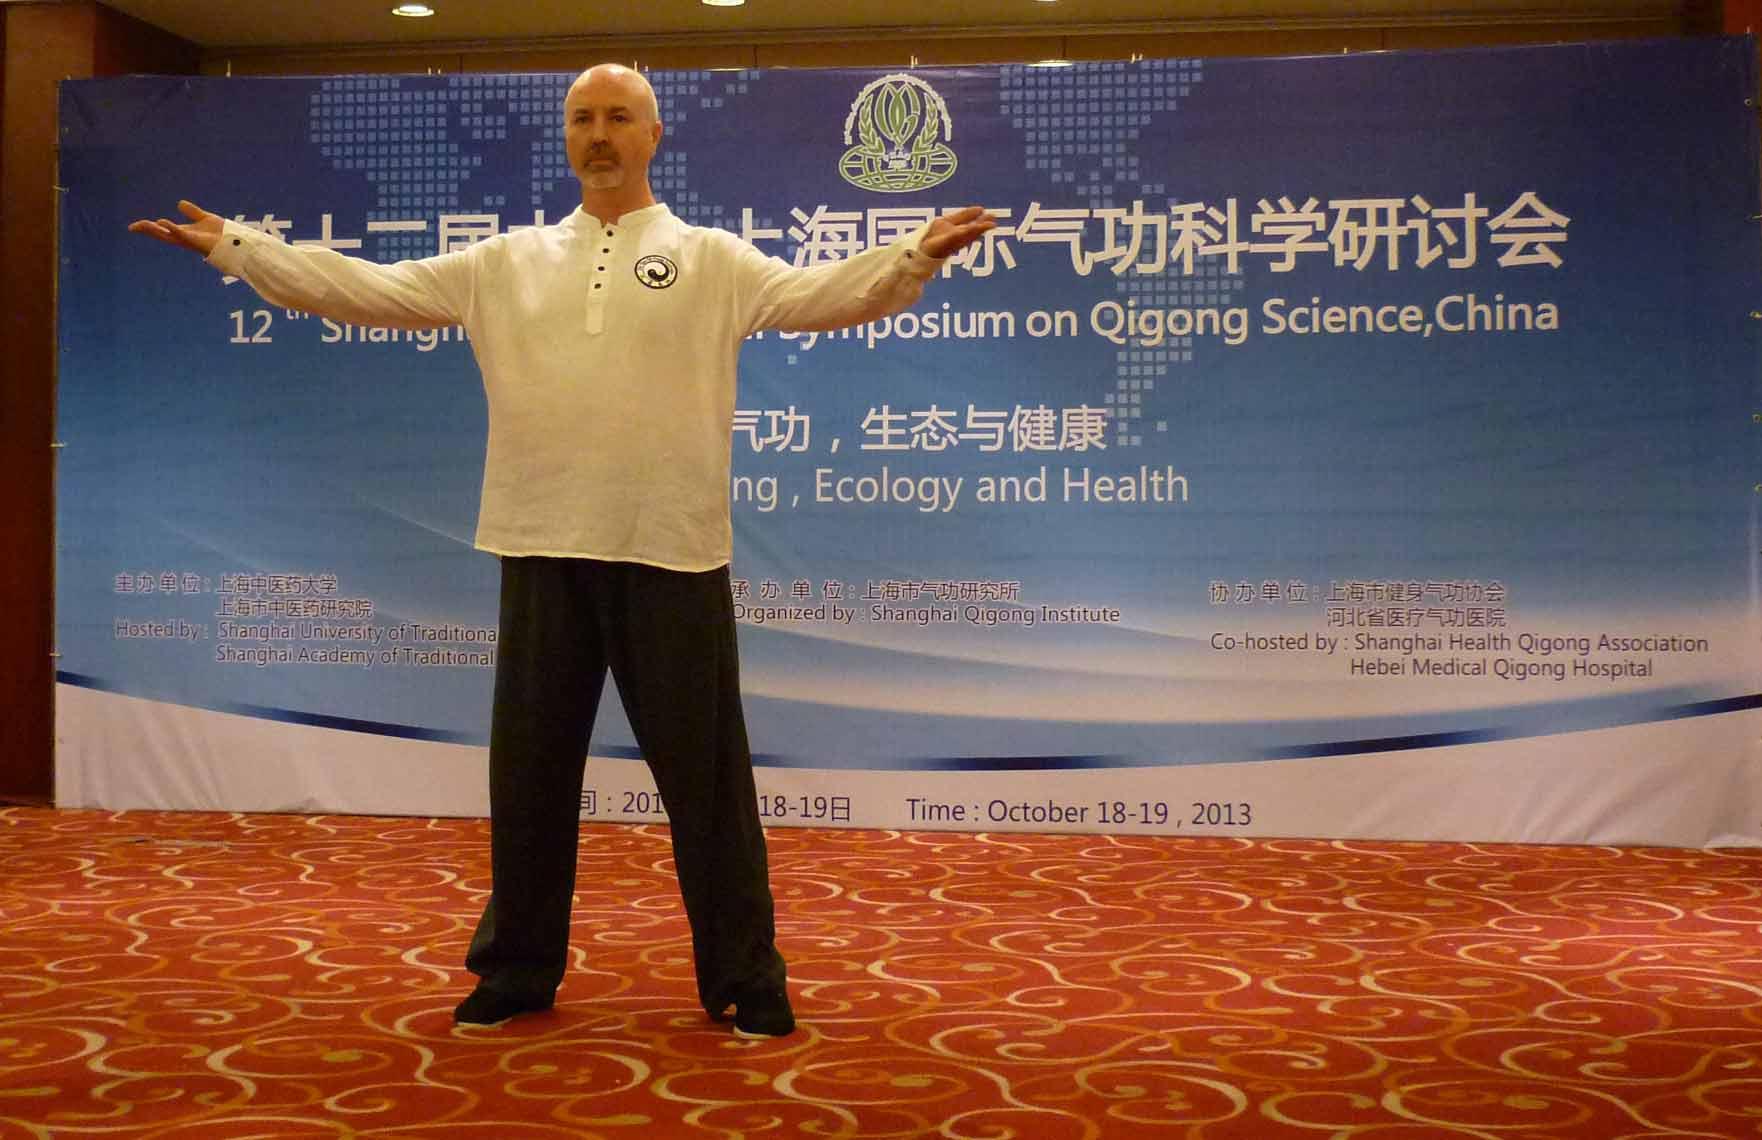 Qigong-Conference-2013-Shanghai-Dayangong-simonblowqigong